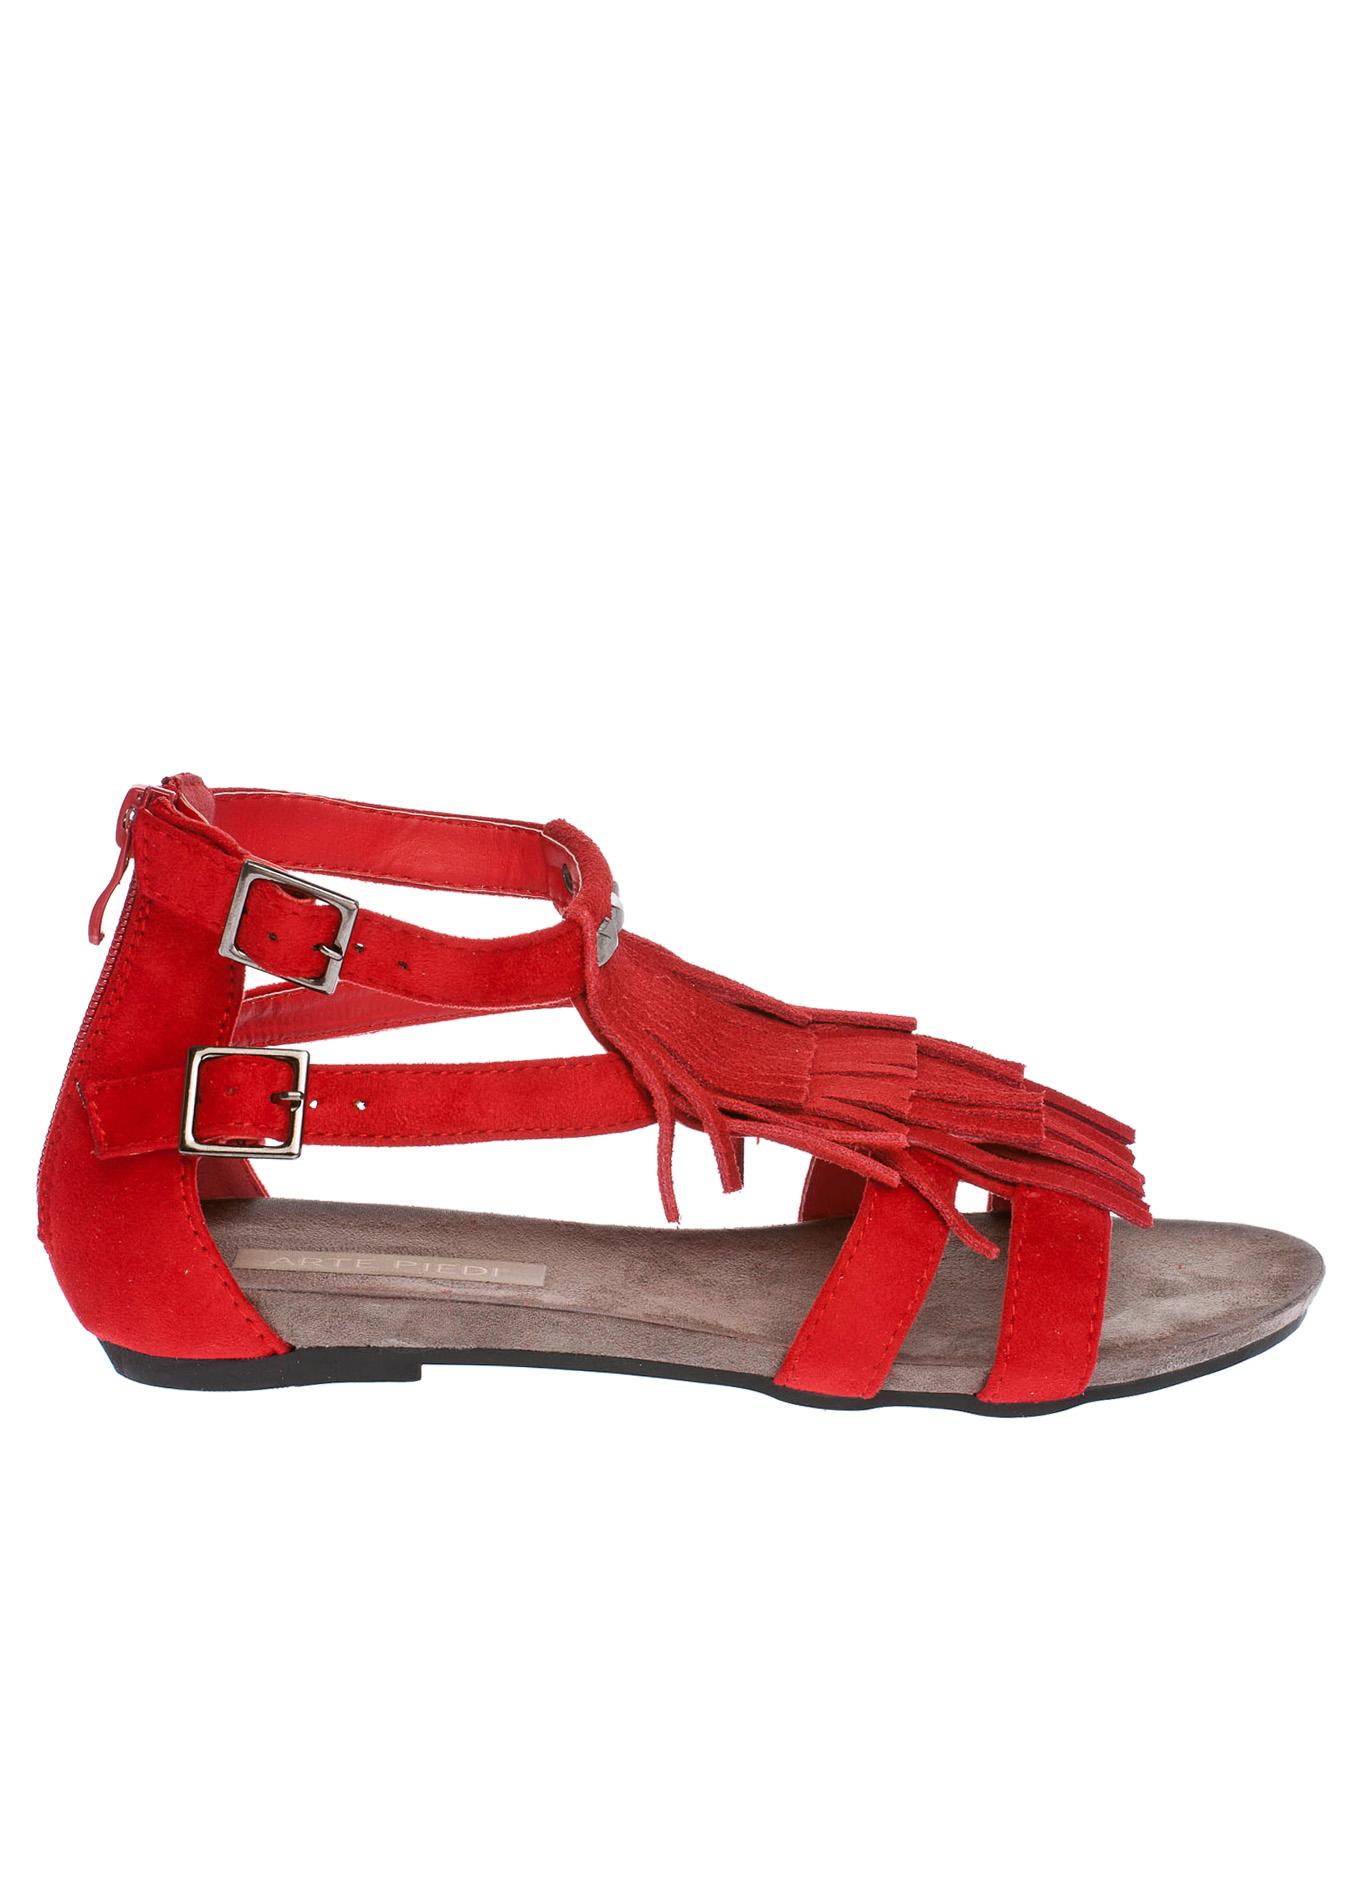 Amelia fringe σανδάλι, κόκκινο παπούτσια